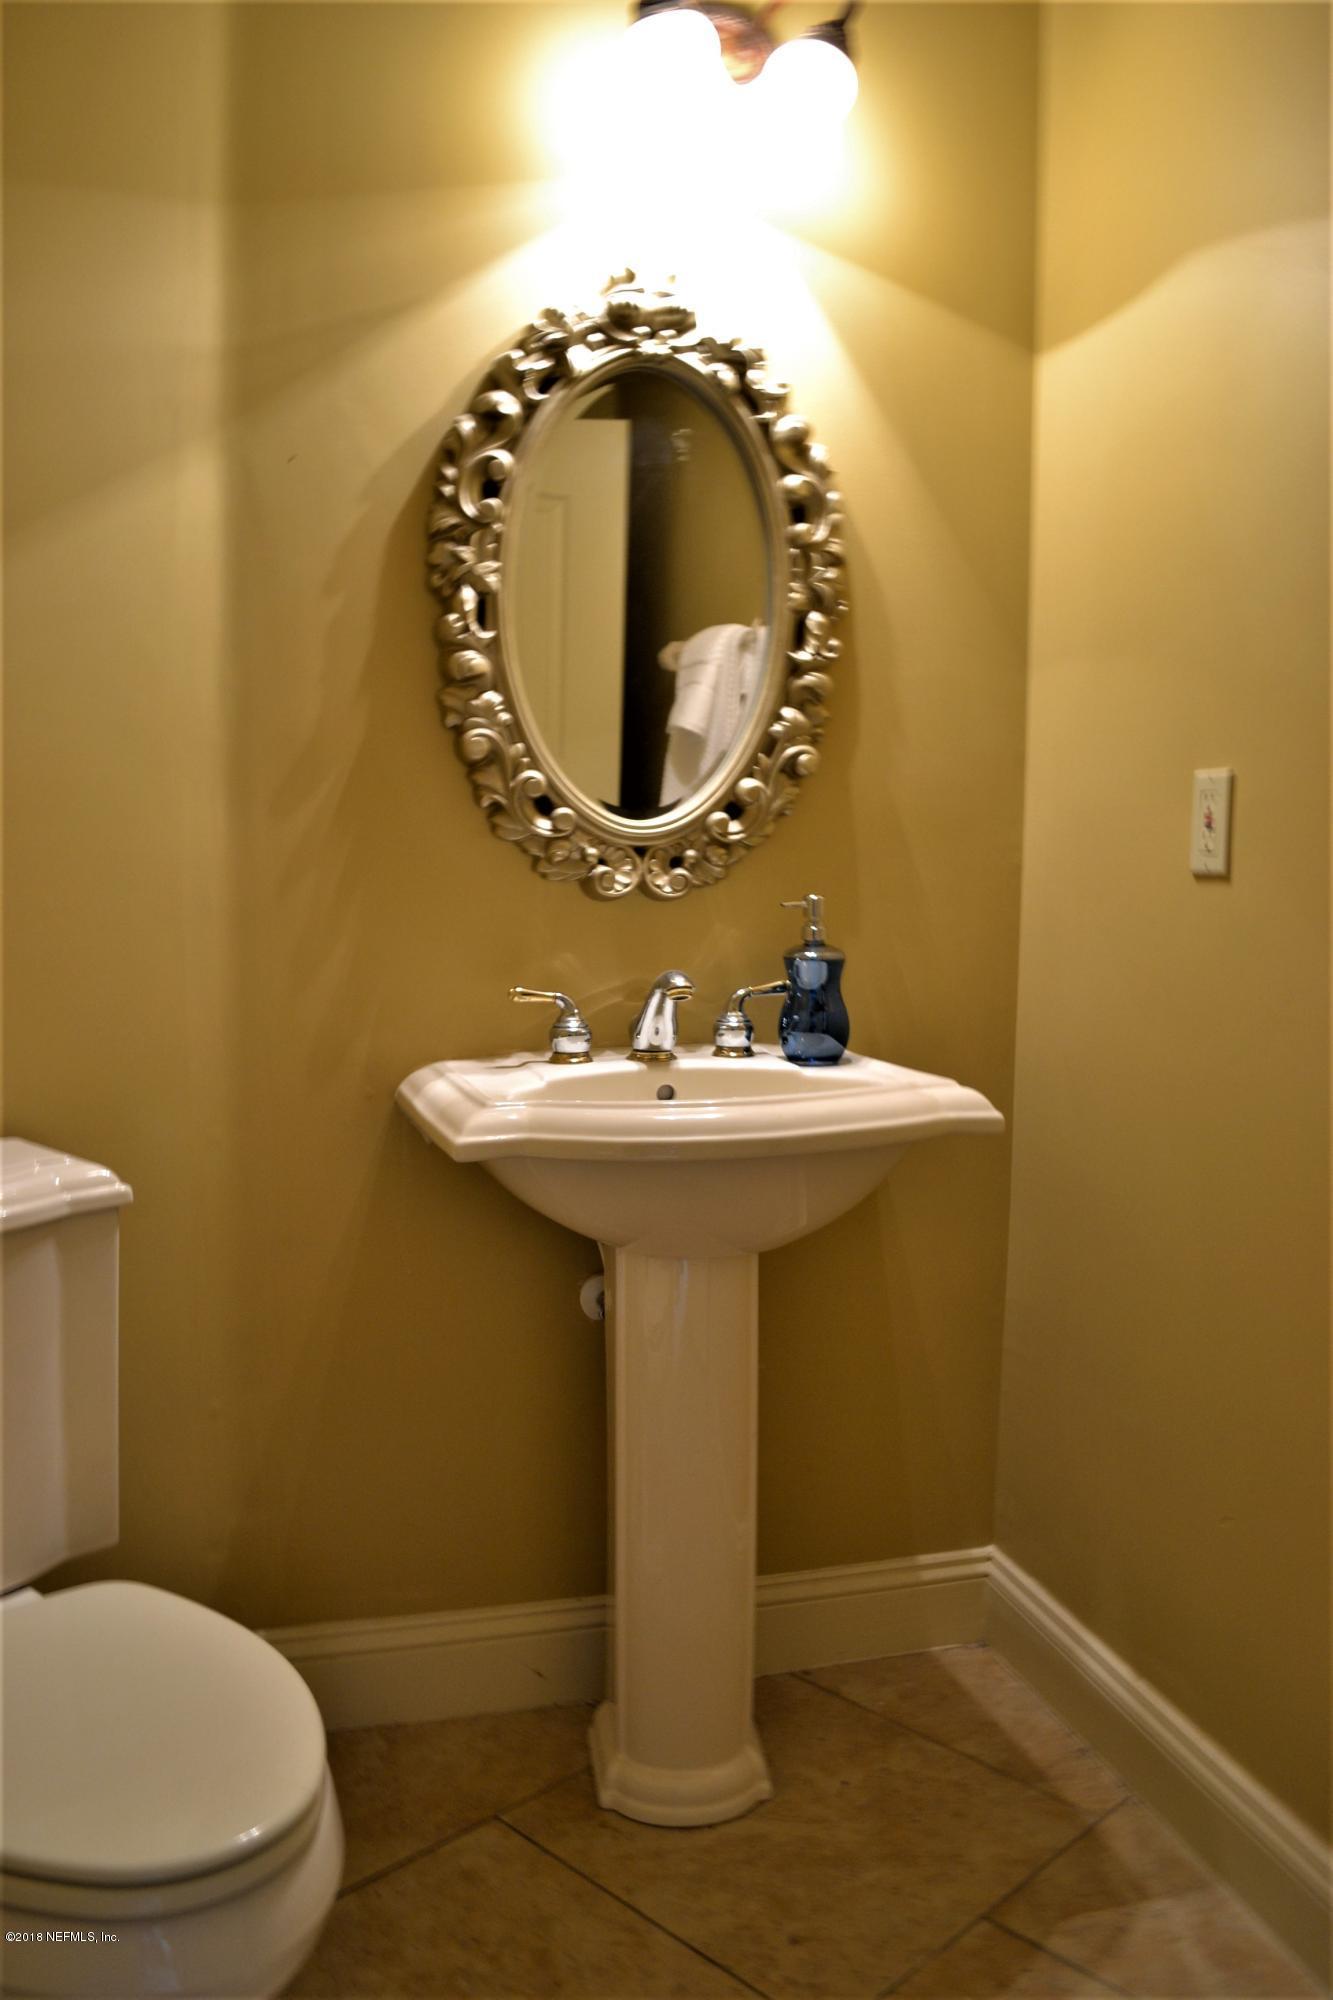 2586 MANOR, ORANGE PARK, FLORIDA 32073, 5 Bedrooms Bedrooms, ,5 BathroomsBathrooms,Residential - single family,For sale,MANOR,959912